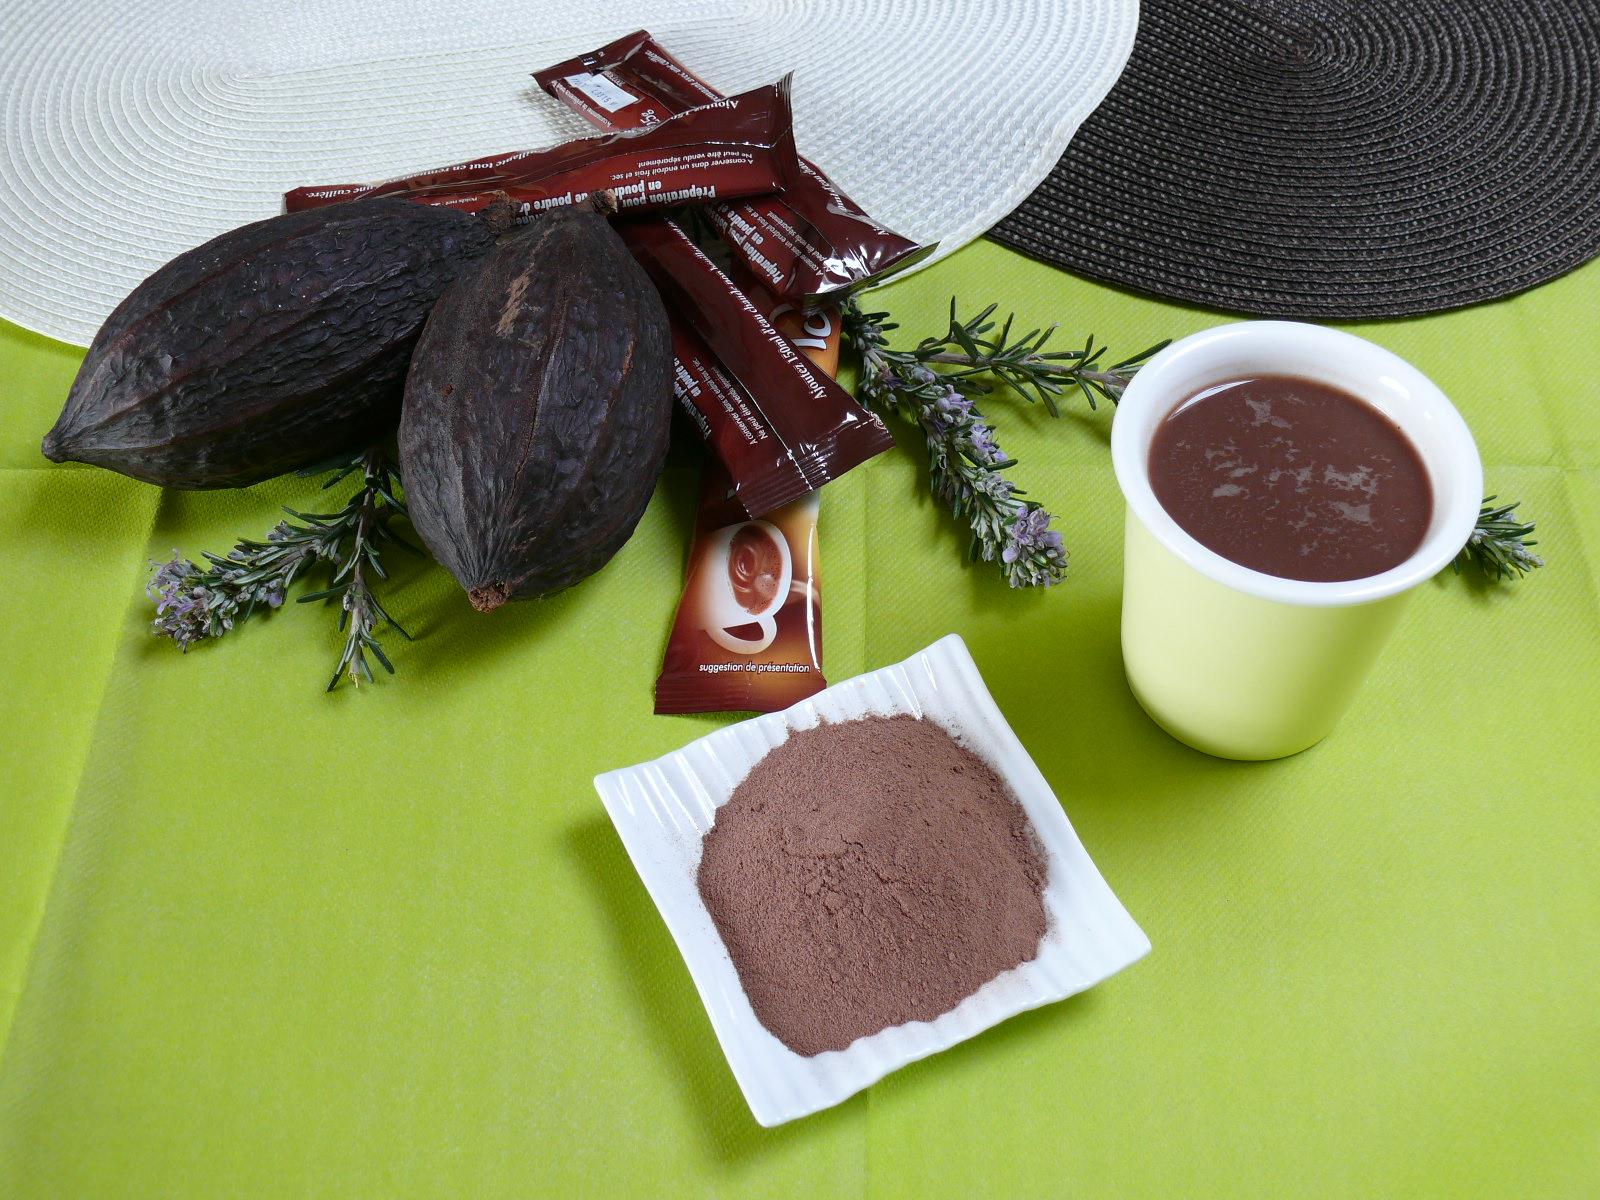 http://www.vici-restauration.com/wp-content/uploads/chocolat_poudre_CE_04Avril.jpg.jpg